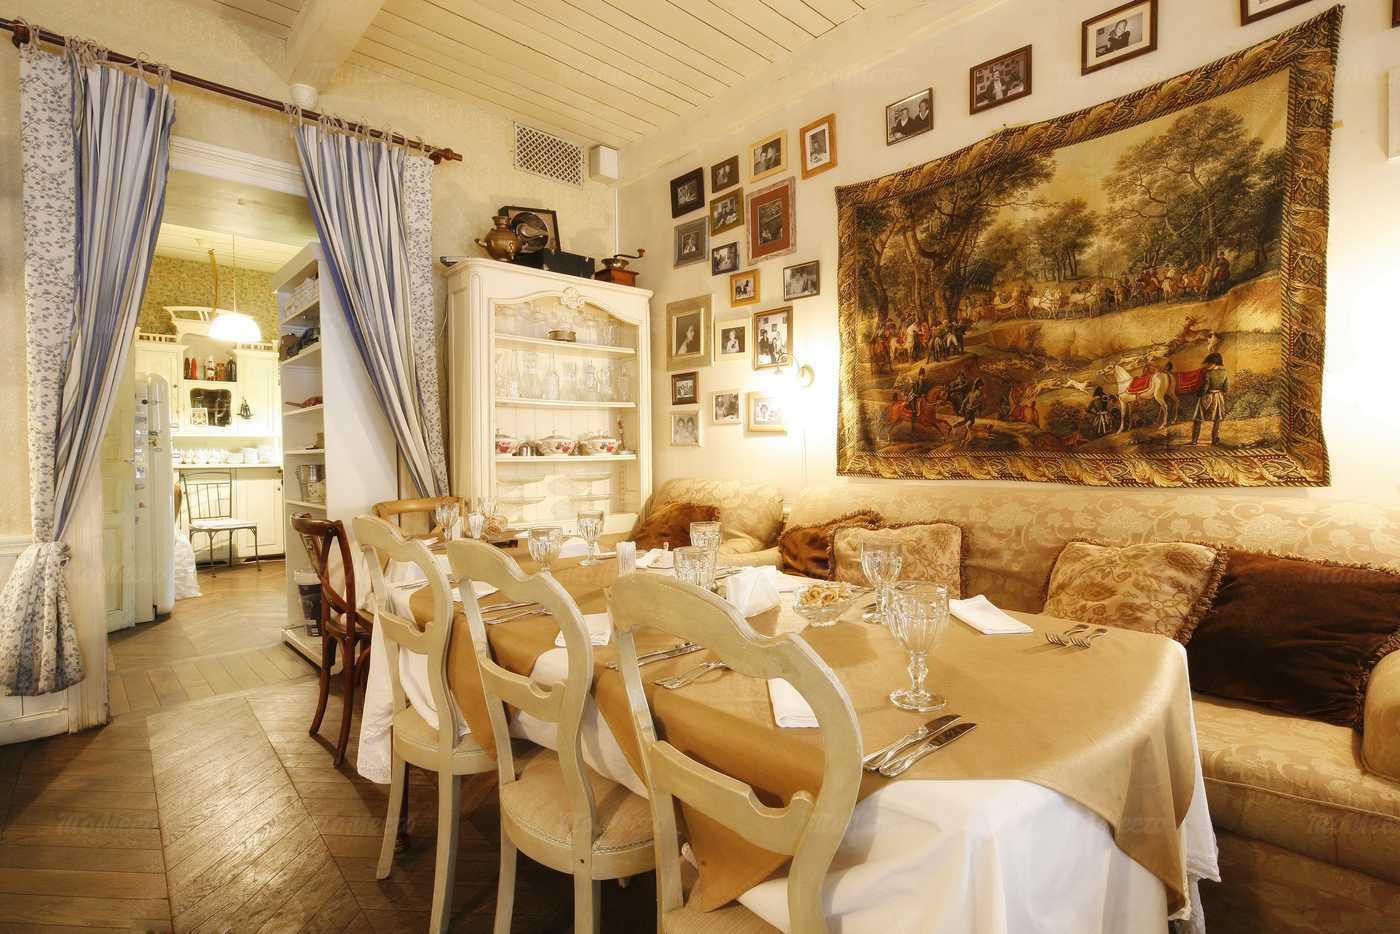 Меню ресторана МариВанна (МариVanna) на улице Ленина